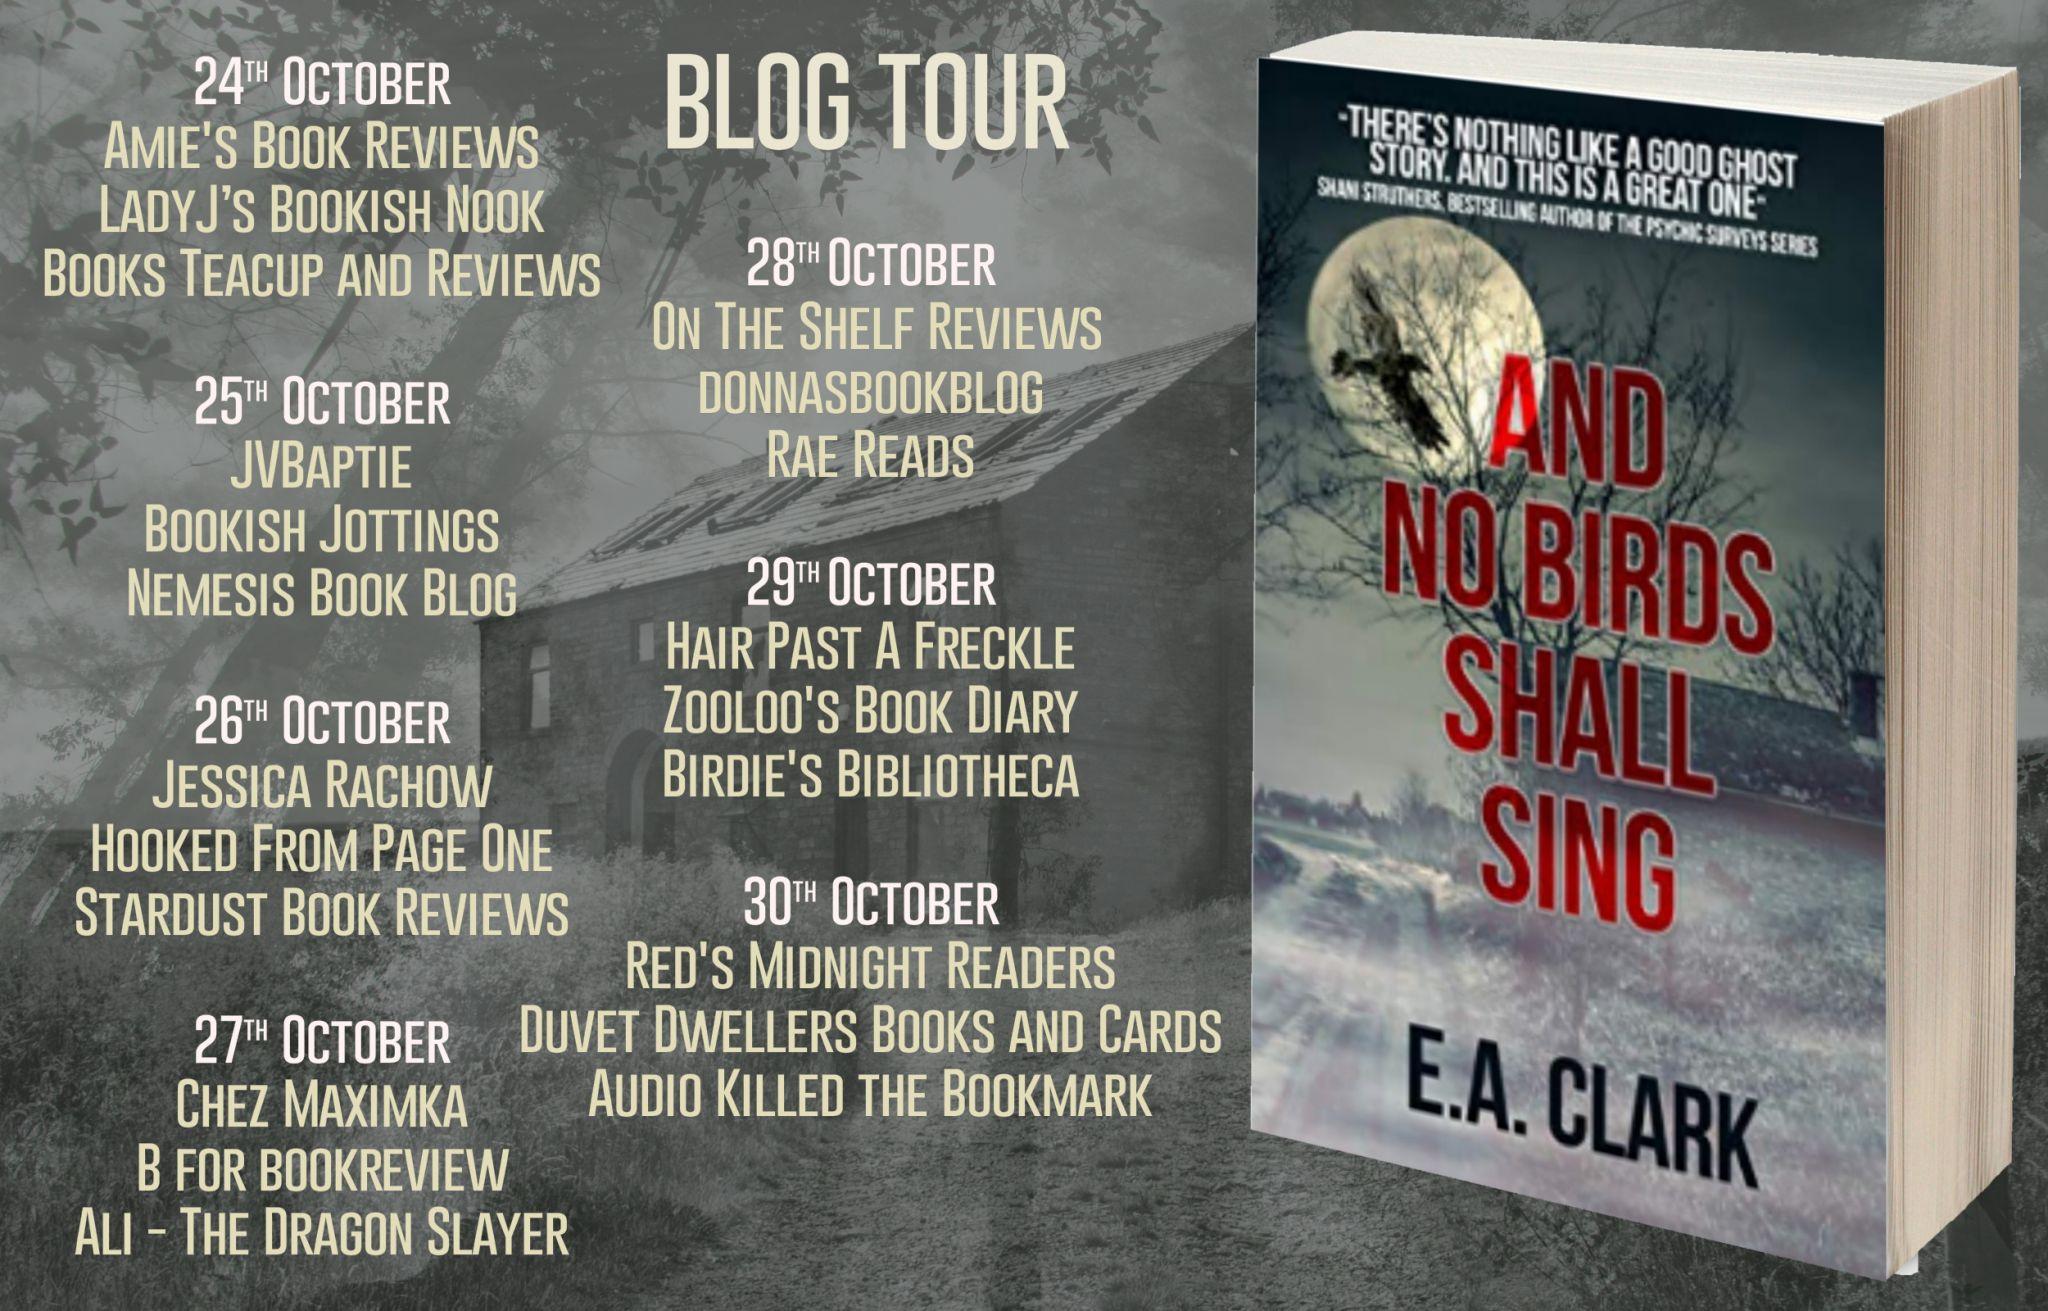 #BookReview of And No bird shall sing by E.A Clark @EAClarkAuthor @rararesources @crookedcatbooks #AndNoBirdsShallSing